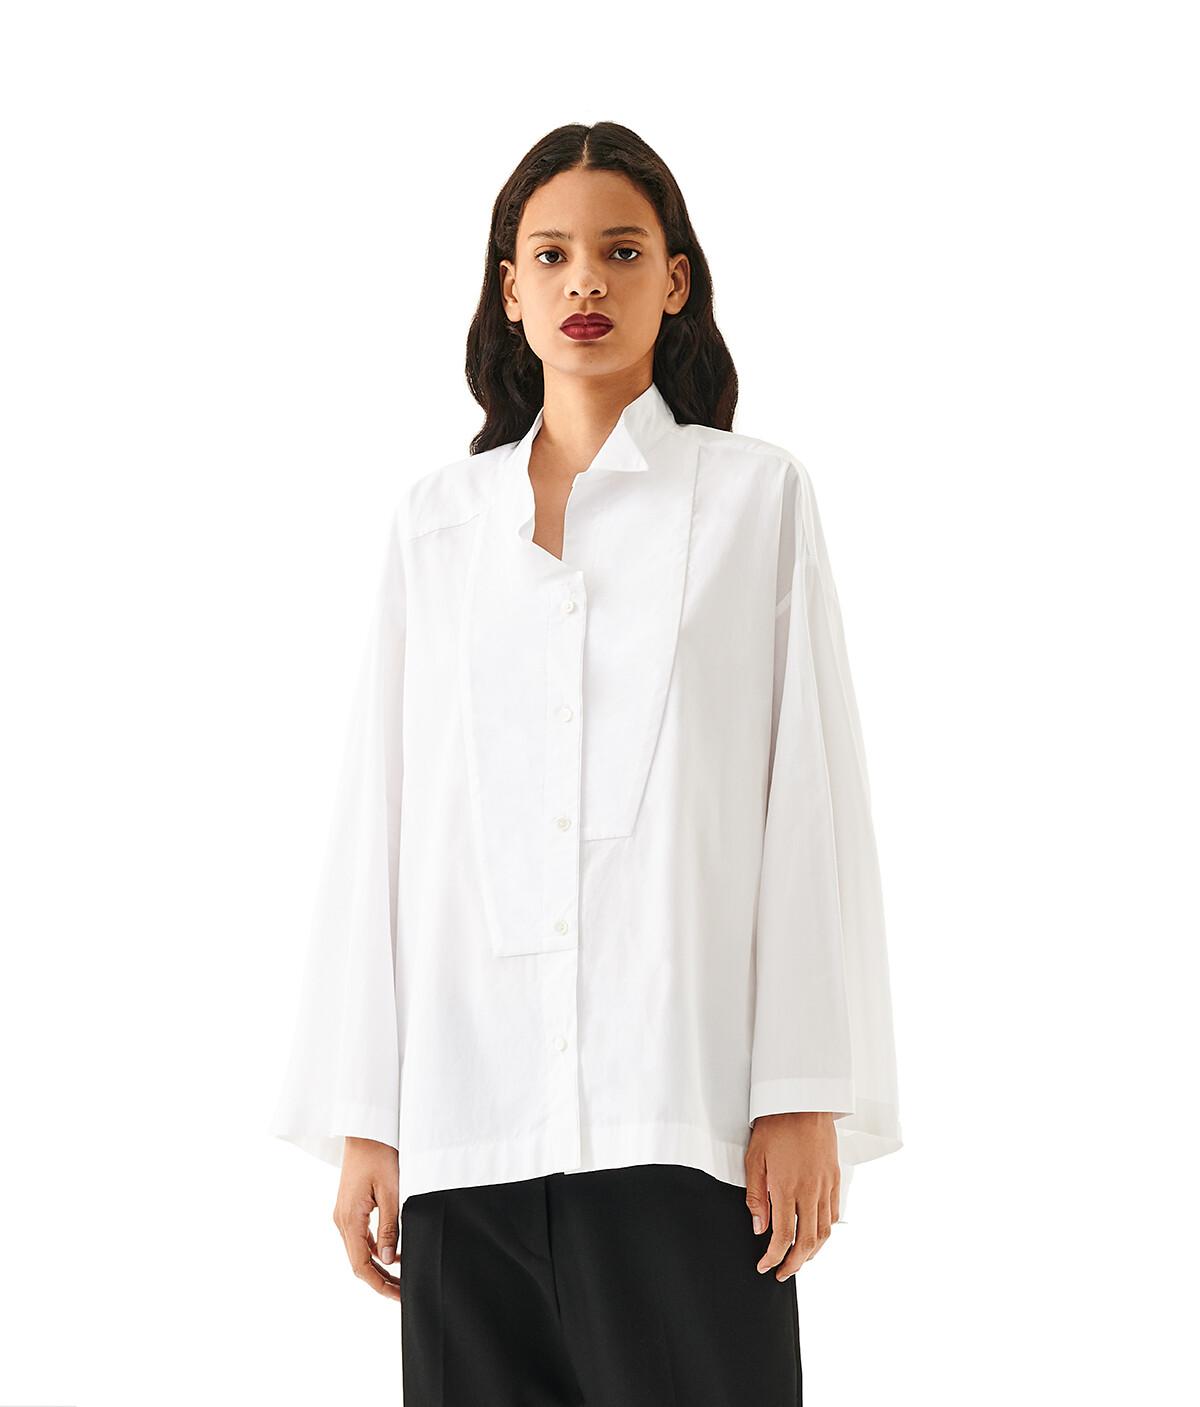 LOEWE Oversize Shirt Blanco front